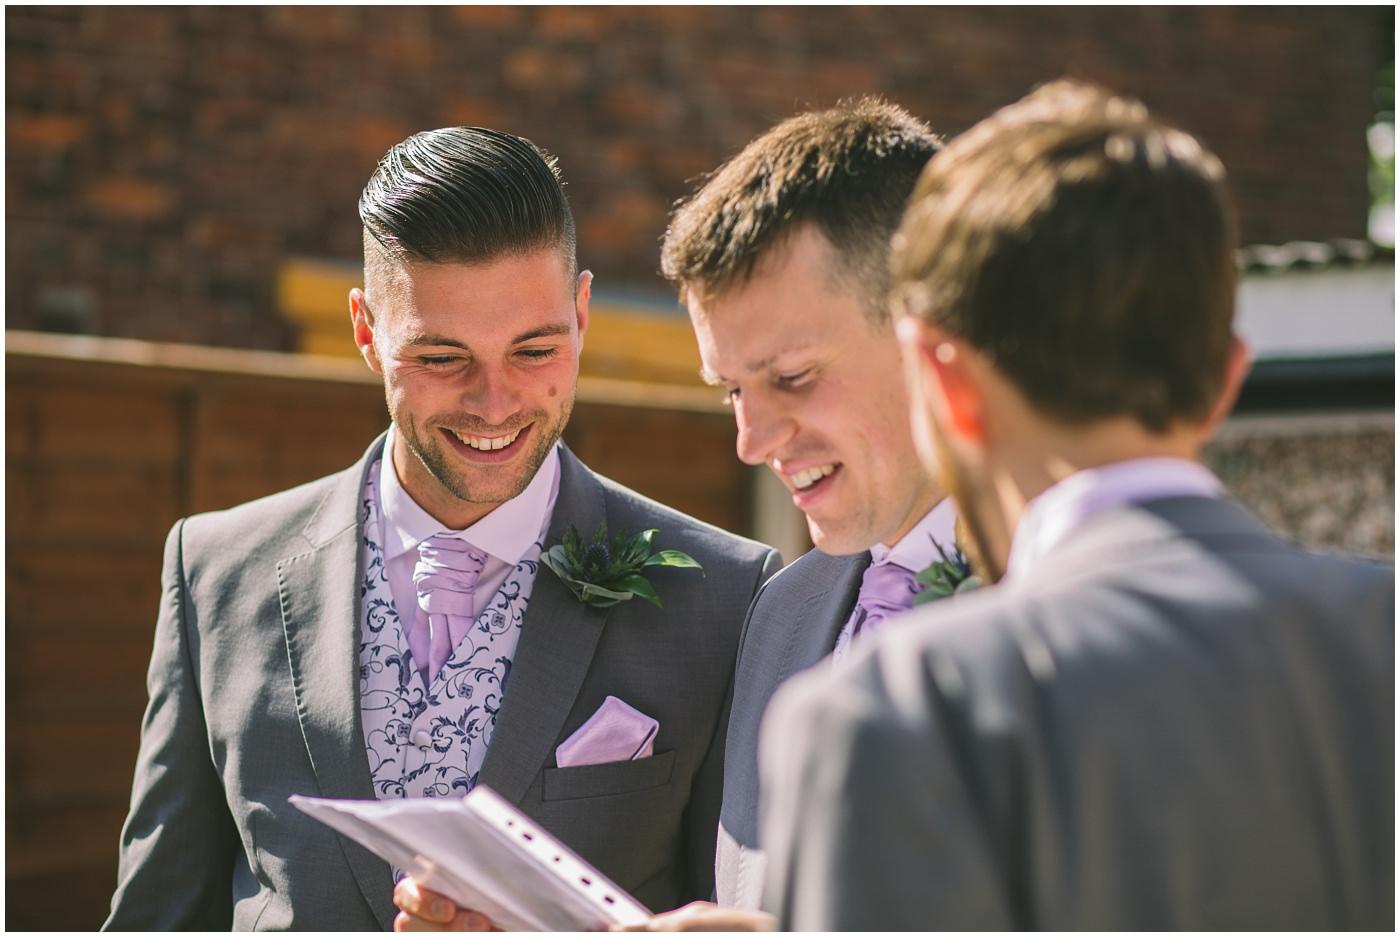 Best man checks his speech before the wedding